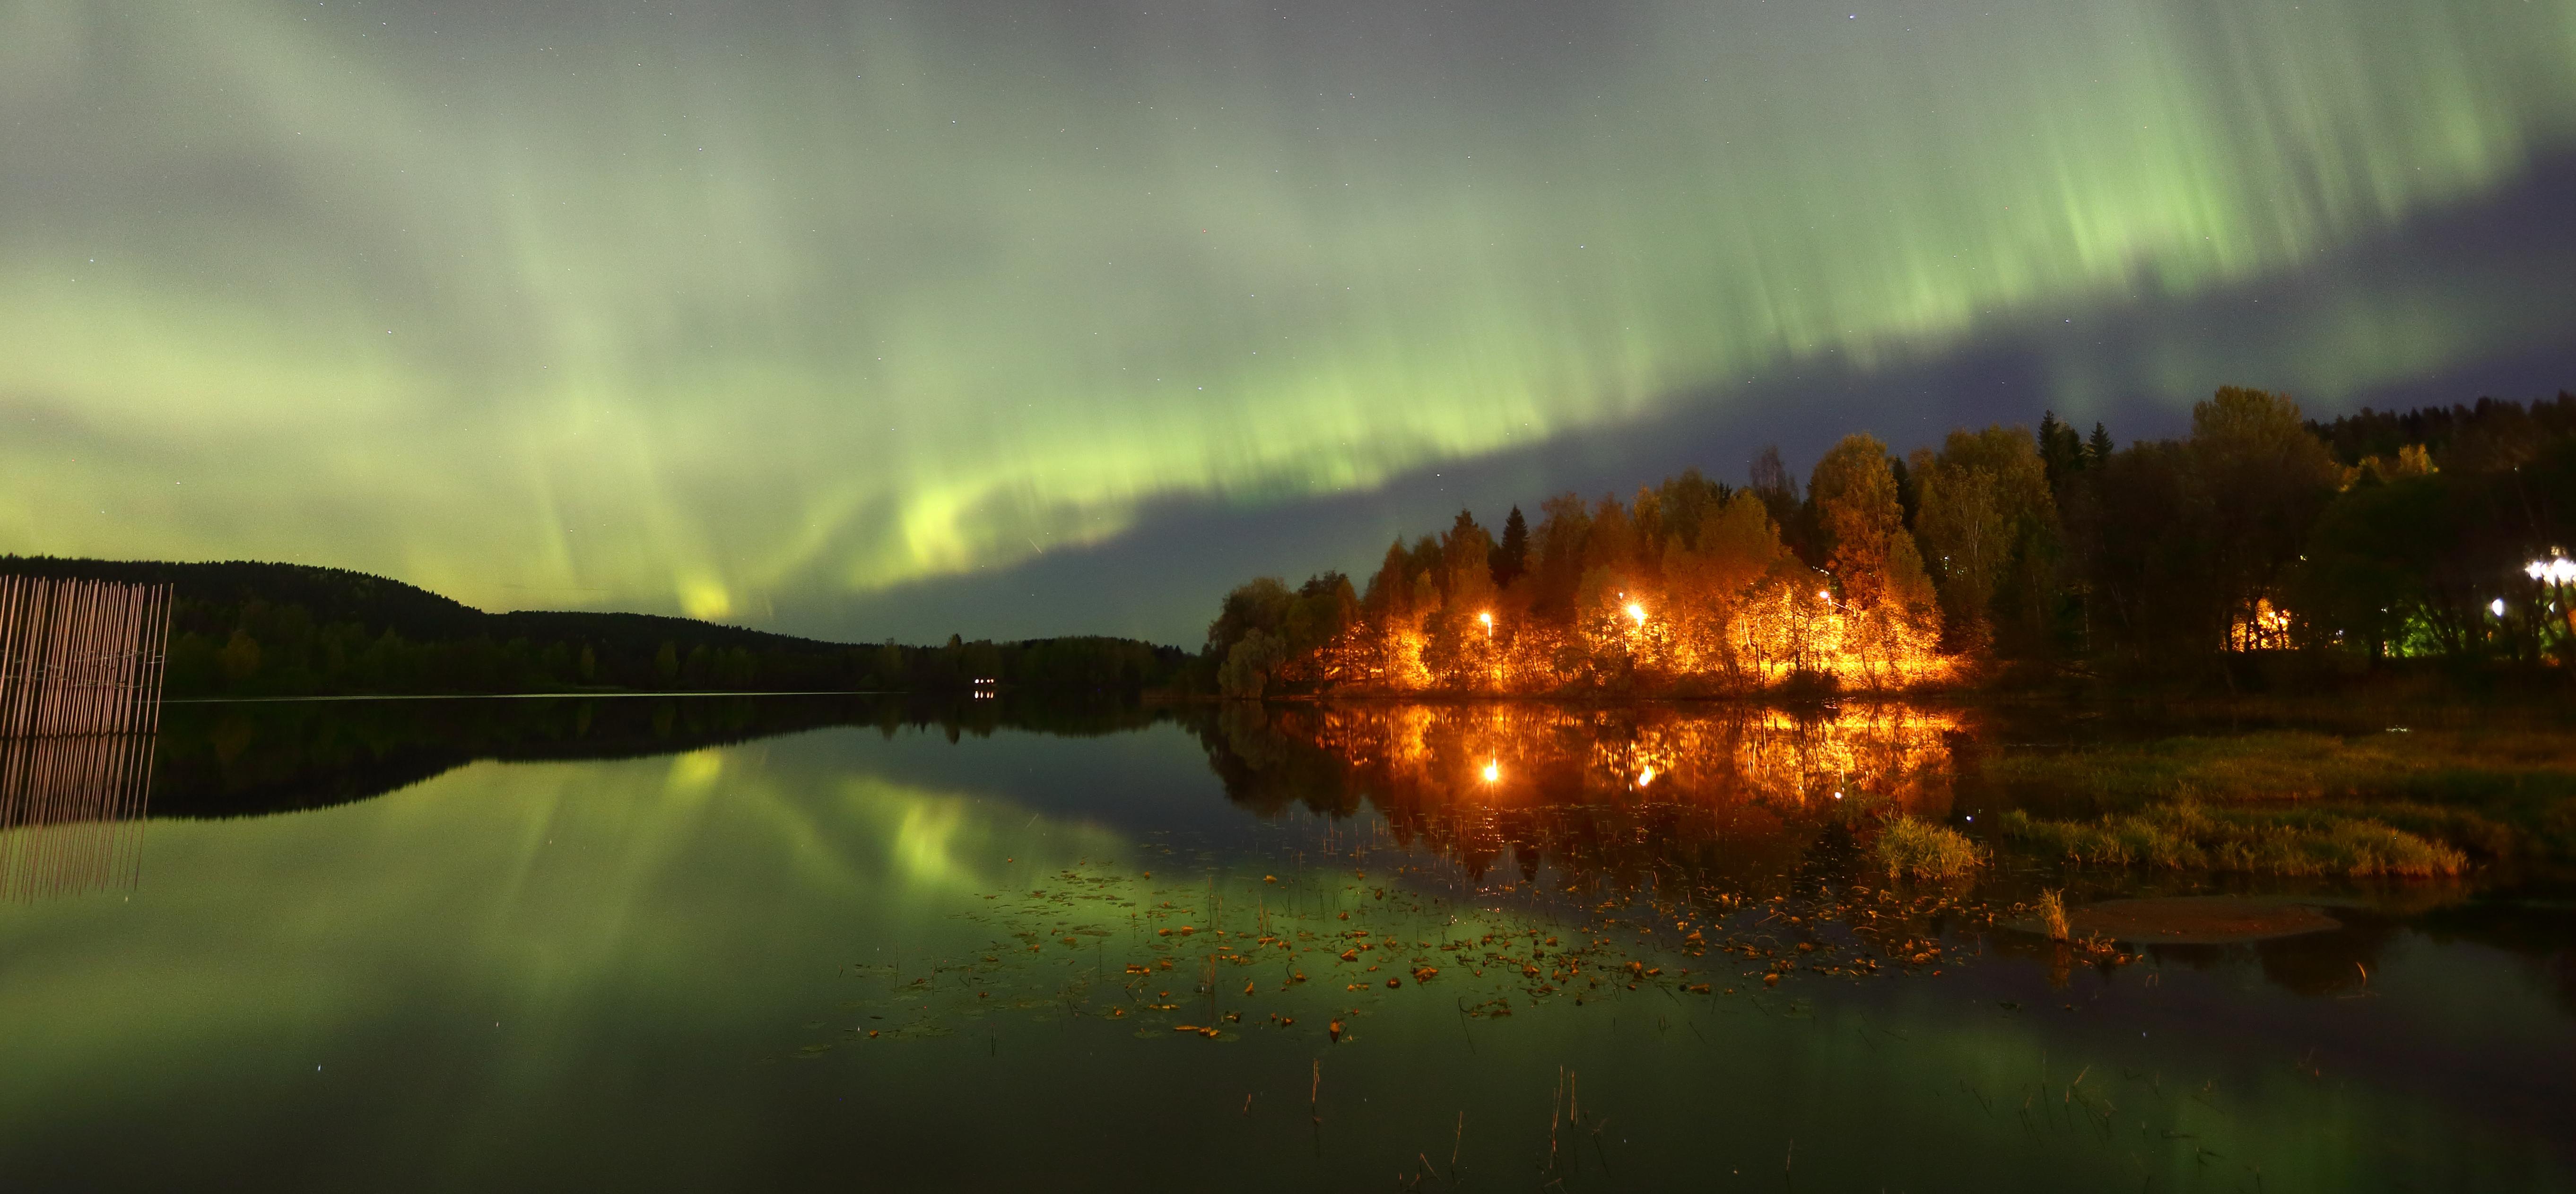 A Dream, The Nothern Lights © Gulsum Sahin